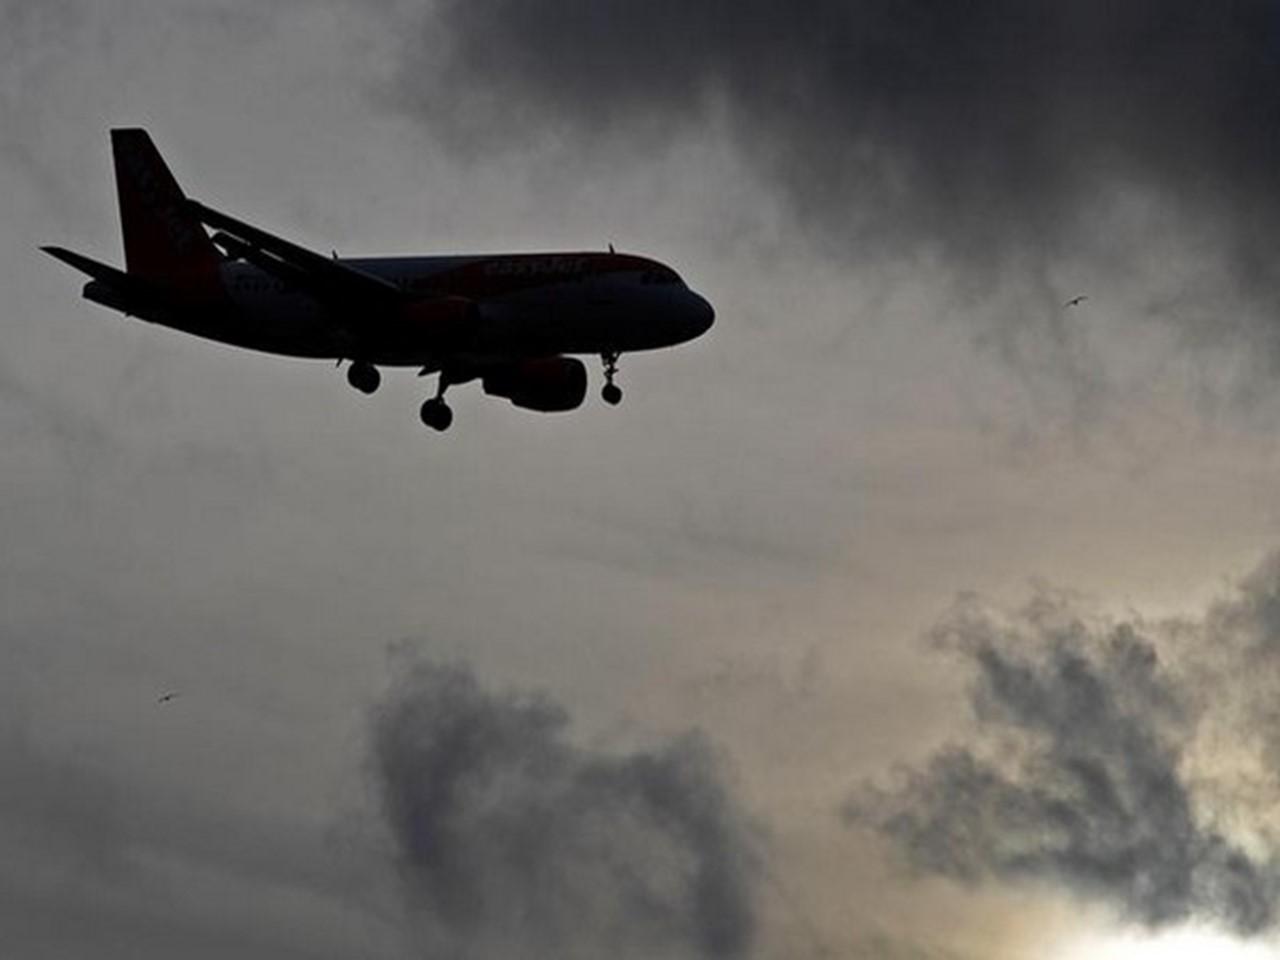 Breaking: Plane overruns runway at Istanbul's Sabiha Gokcen airport — Hurriyet